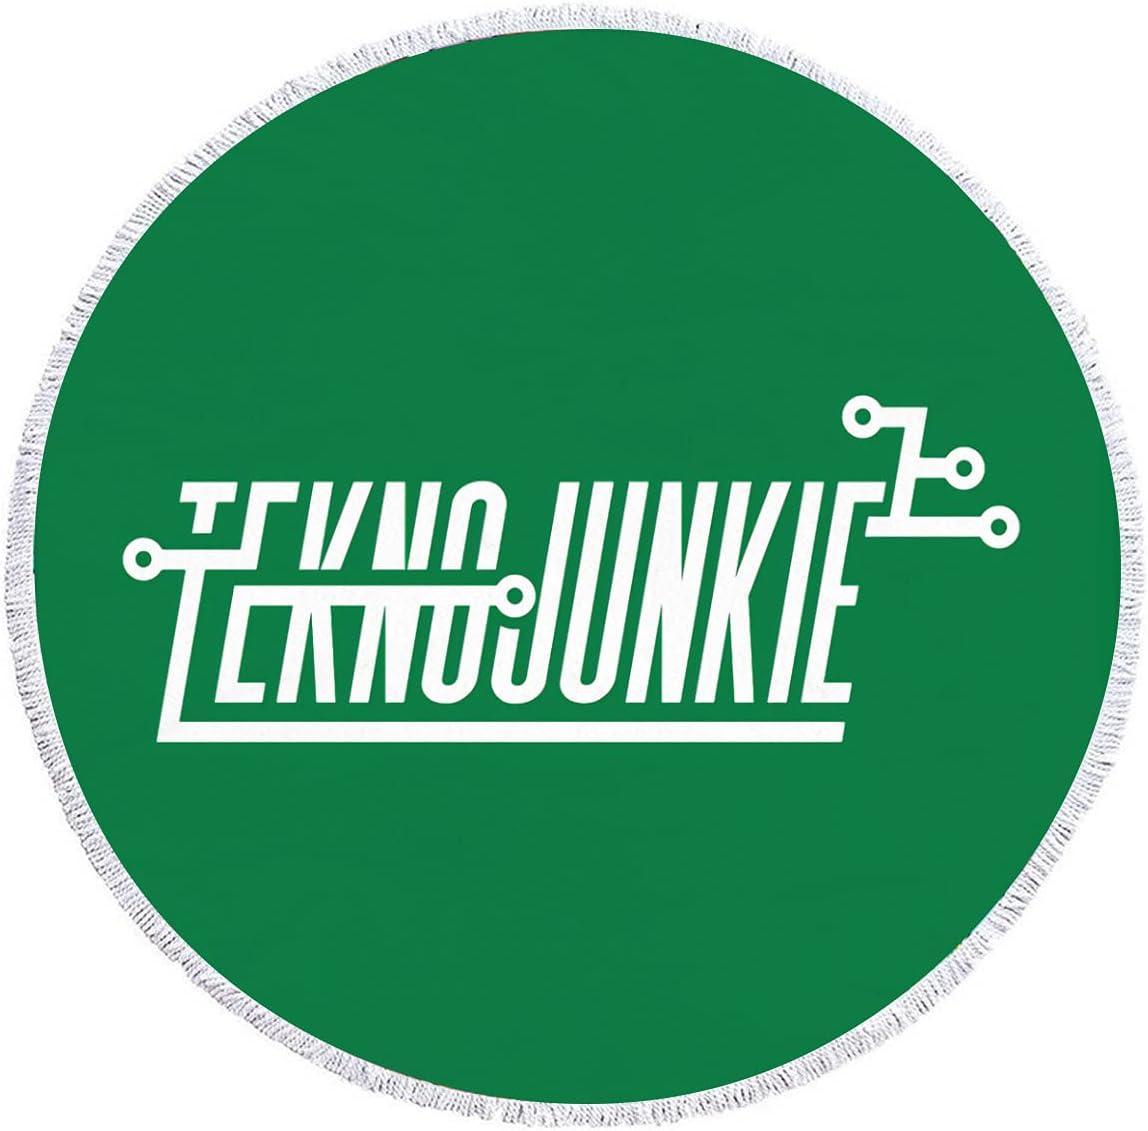 Fees Japan Maker New free TeknoJunkie Dark-Beach Round Towel Dry Quick Beach T